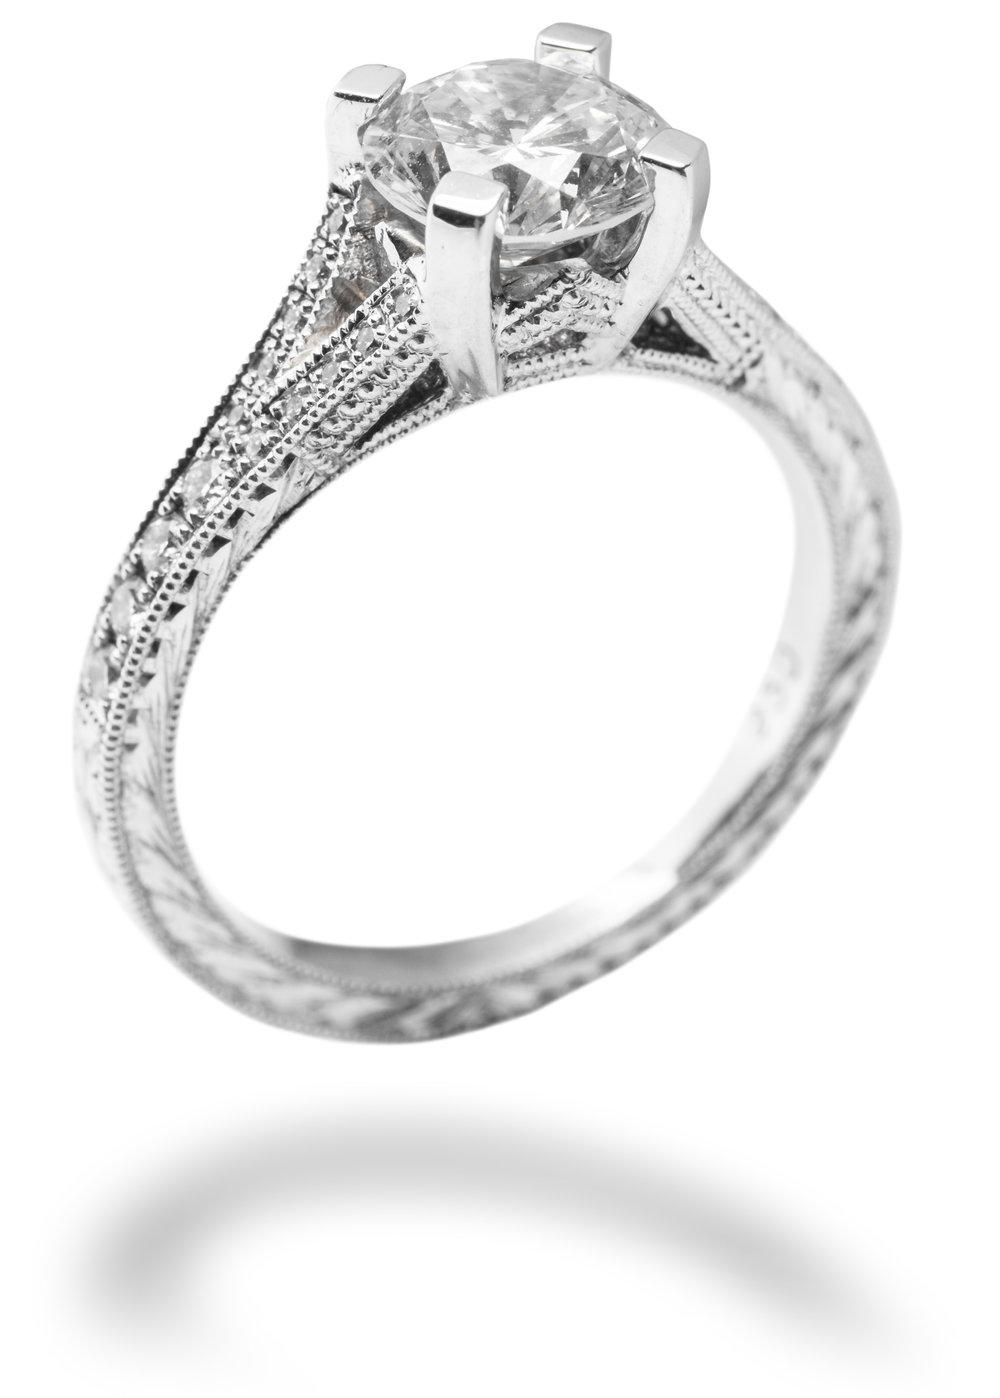 7317_Byzantine_Jewelers_Santa_Cruz_Product_Photography_edit.jpg